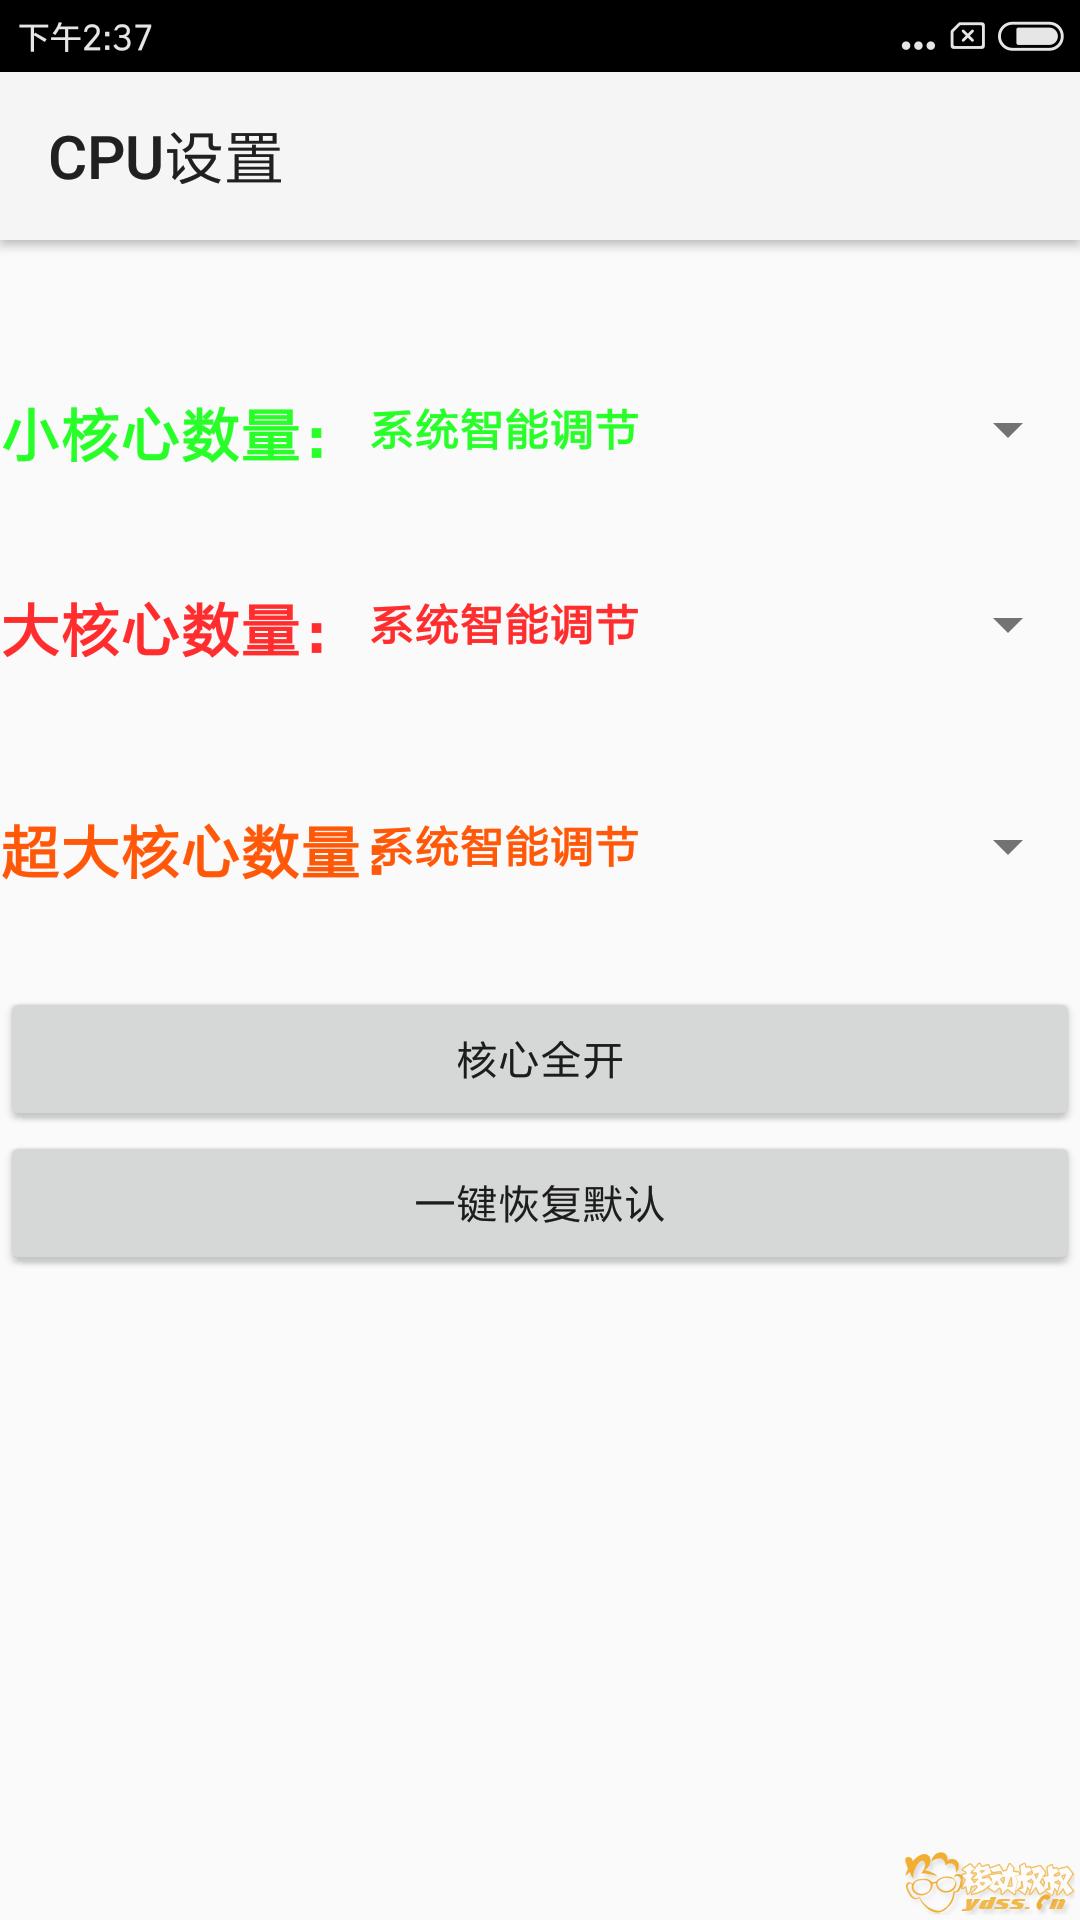 Screenshot_2018-11-08-14-37-53-099_com.eui.xd.png